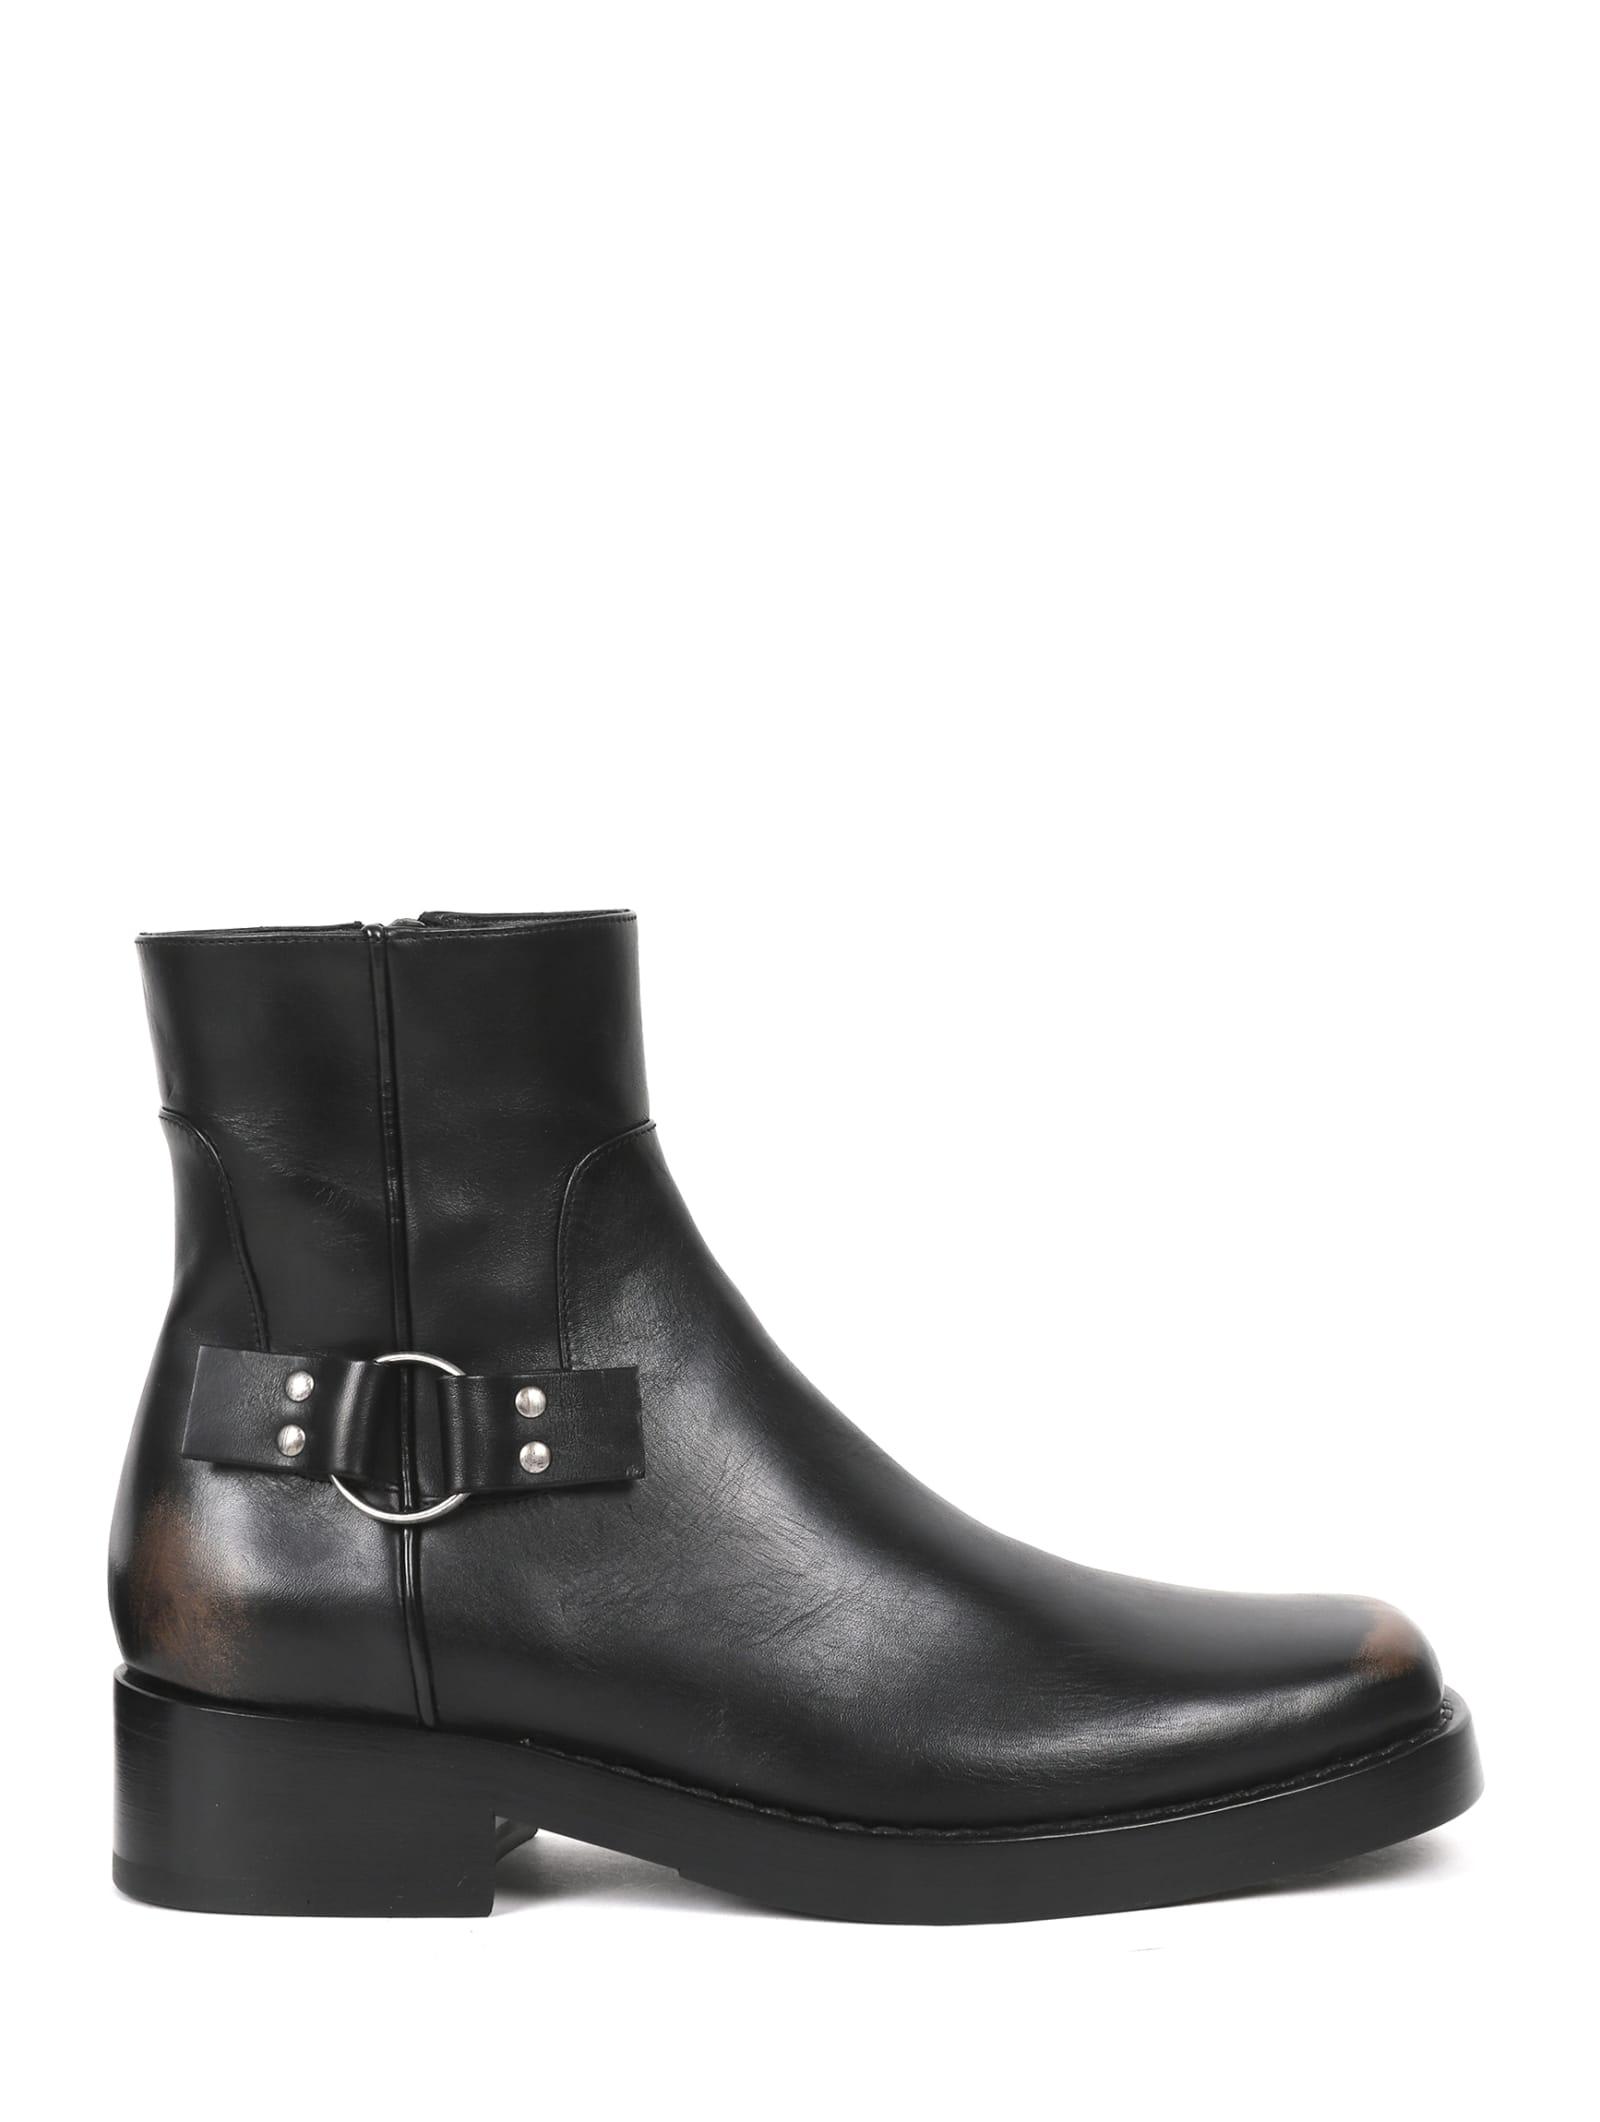 Raf Simons Boots BLACK BOOTS